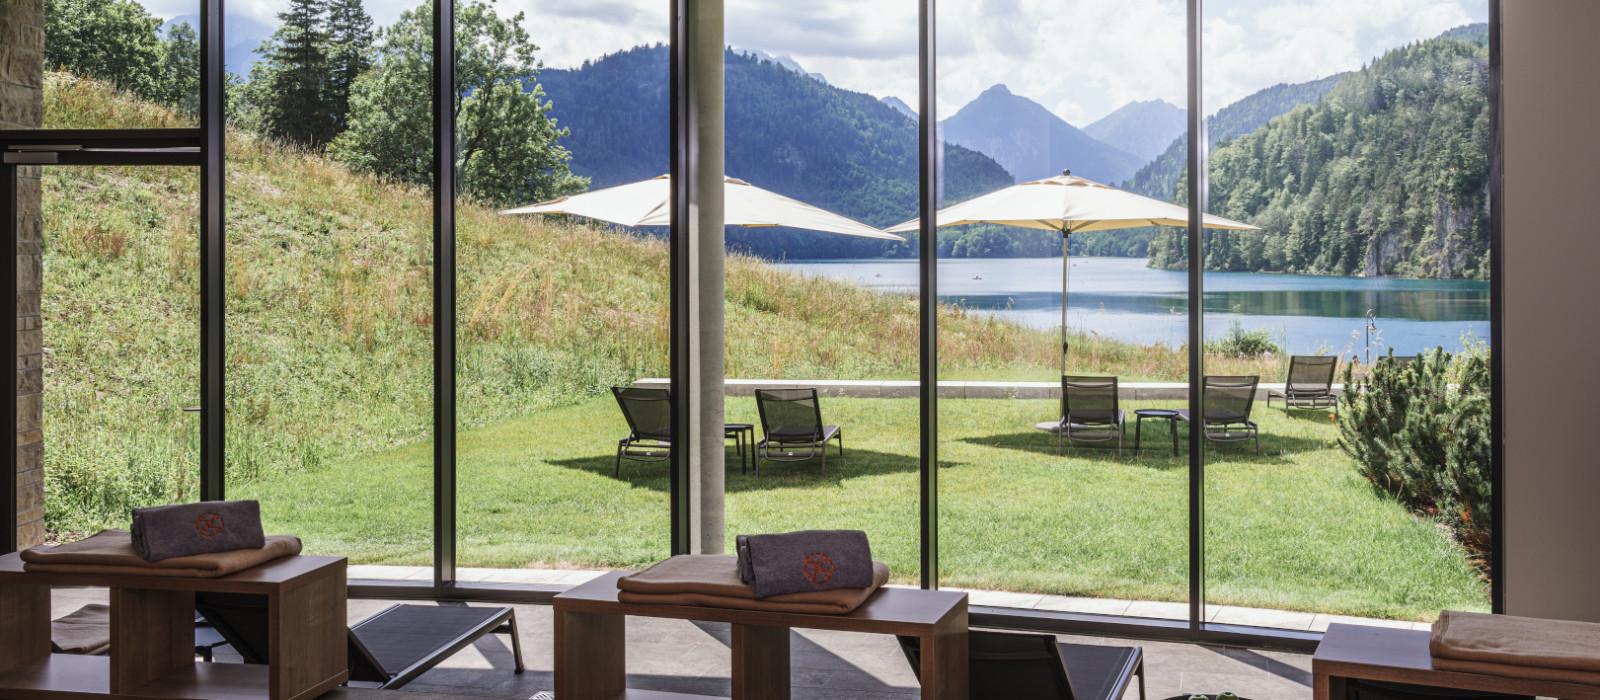 Hotel AMERON Neuschwanstein Alpsee Resort & Spa Germany